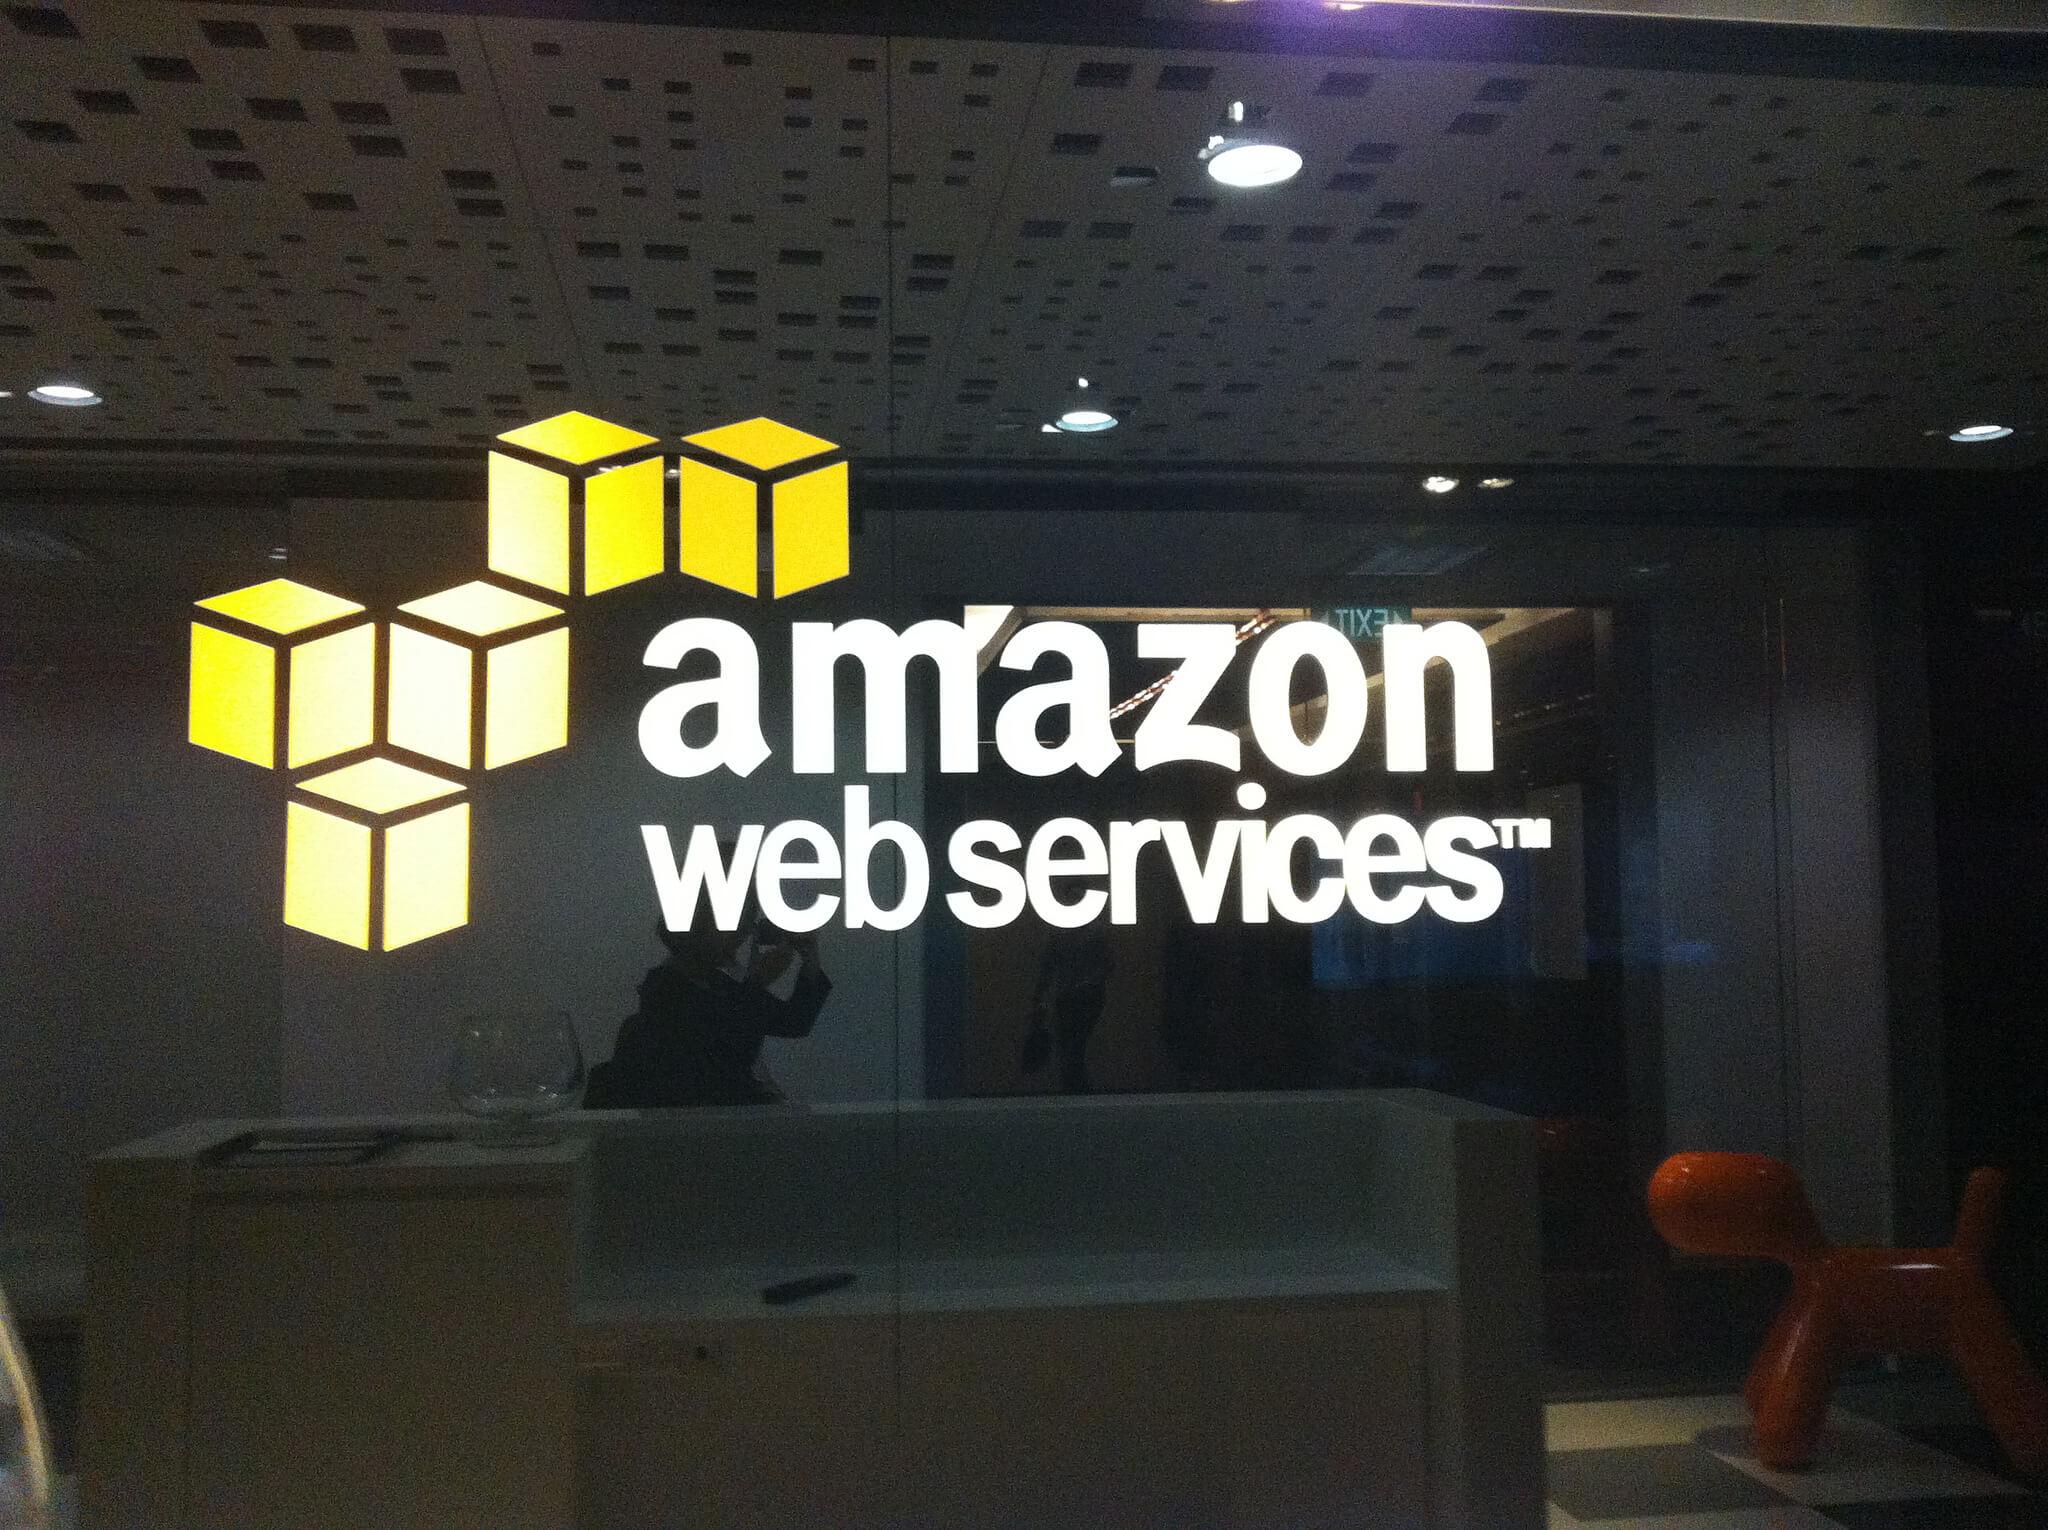 AWS Macie secures sensitive cloud data using AI | VentureBeat